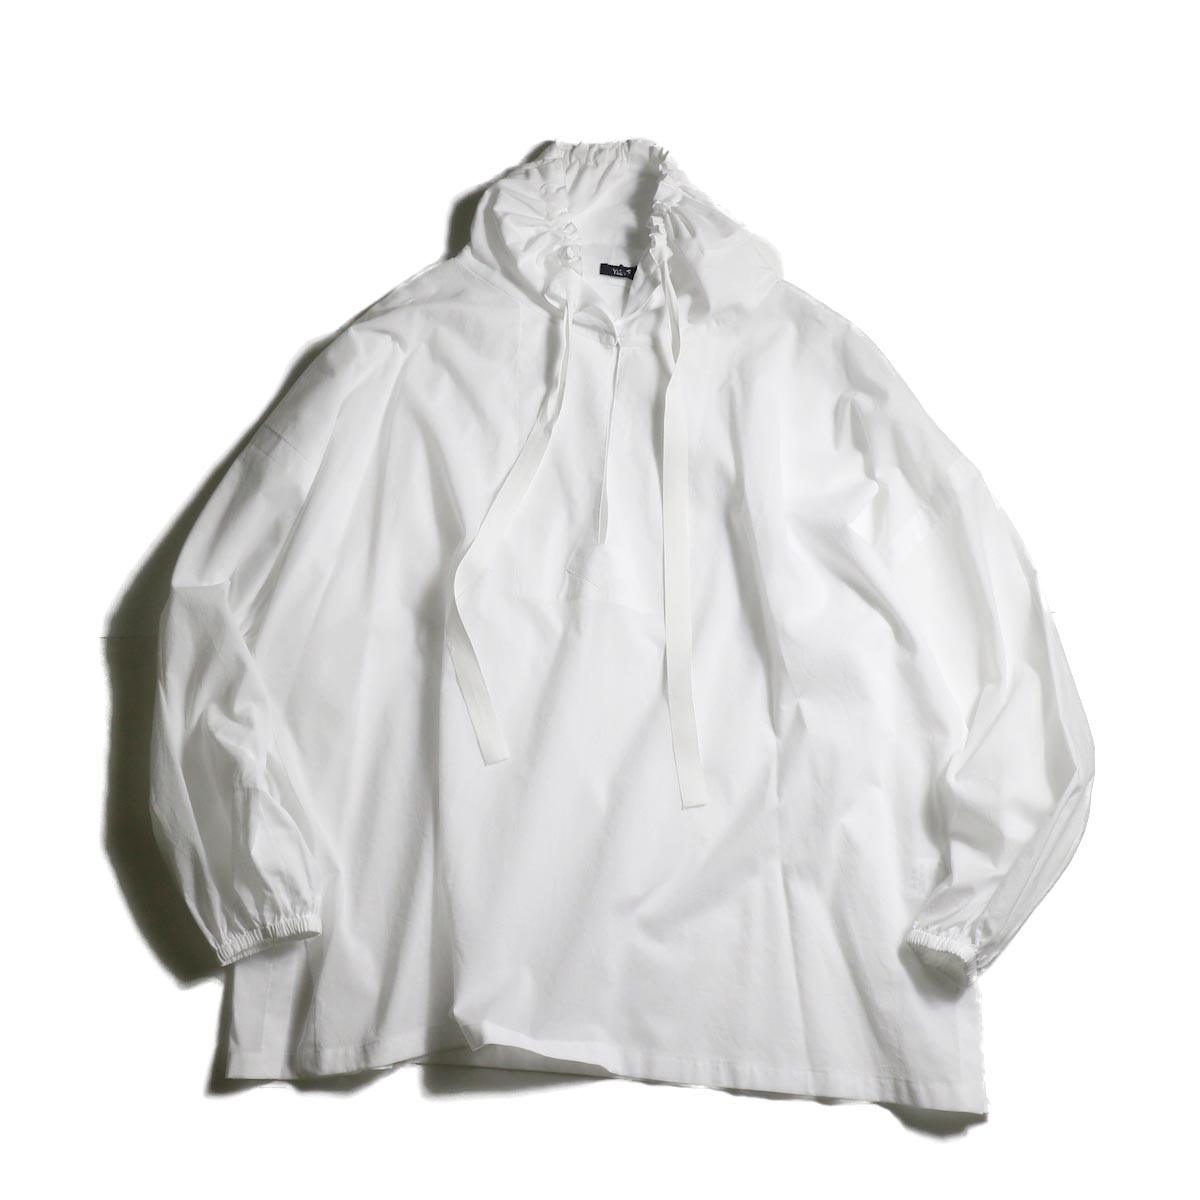 YLEVE / COTTON LAWN BL (White)